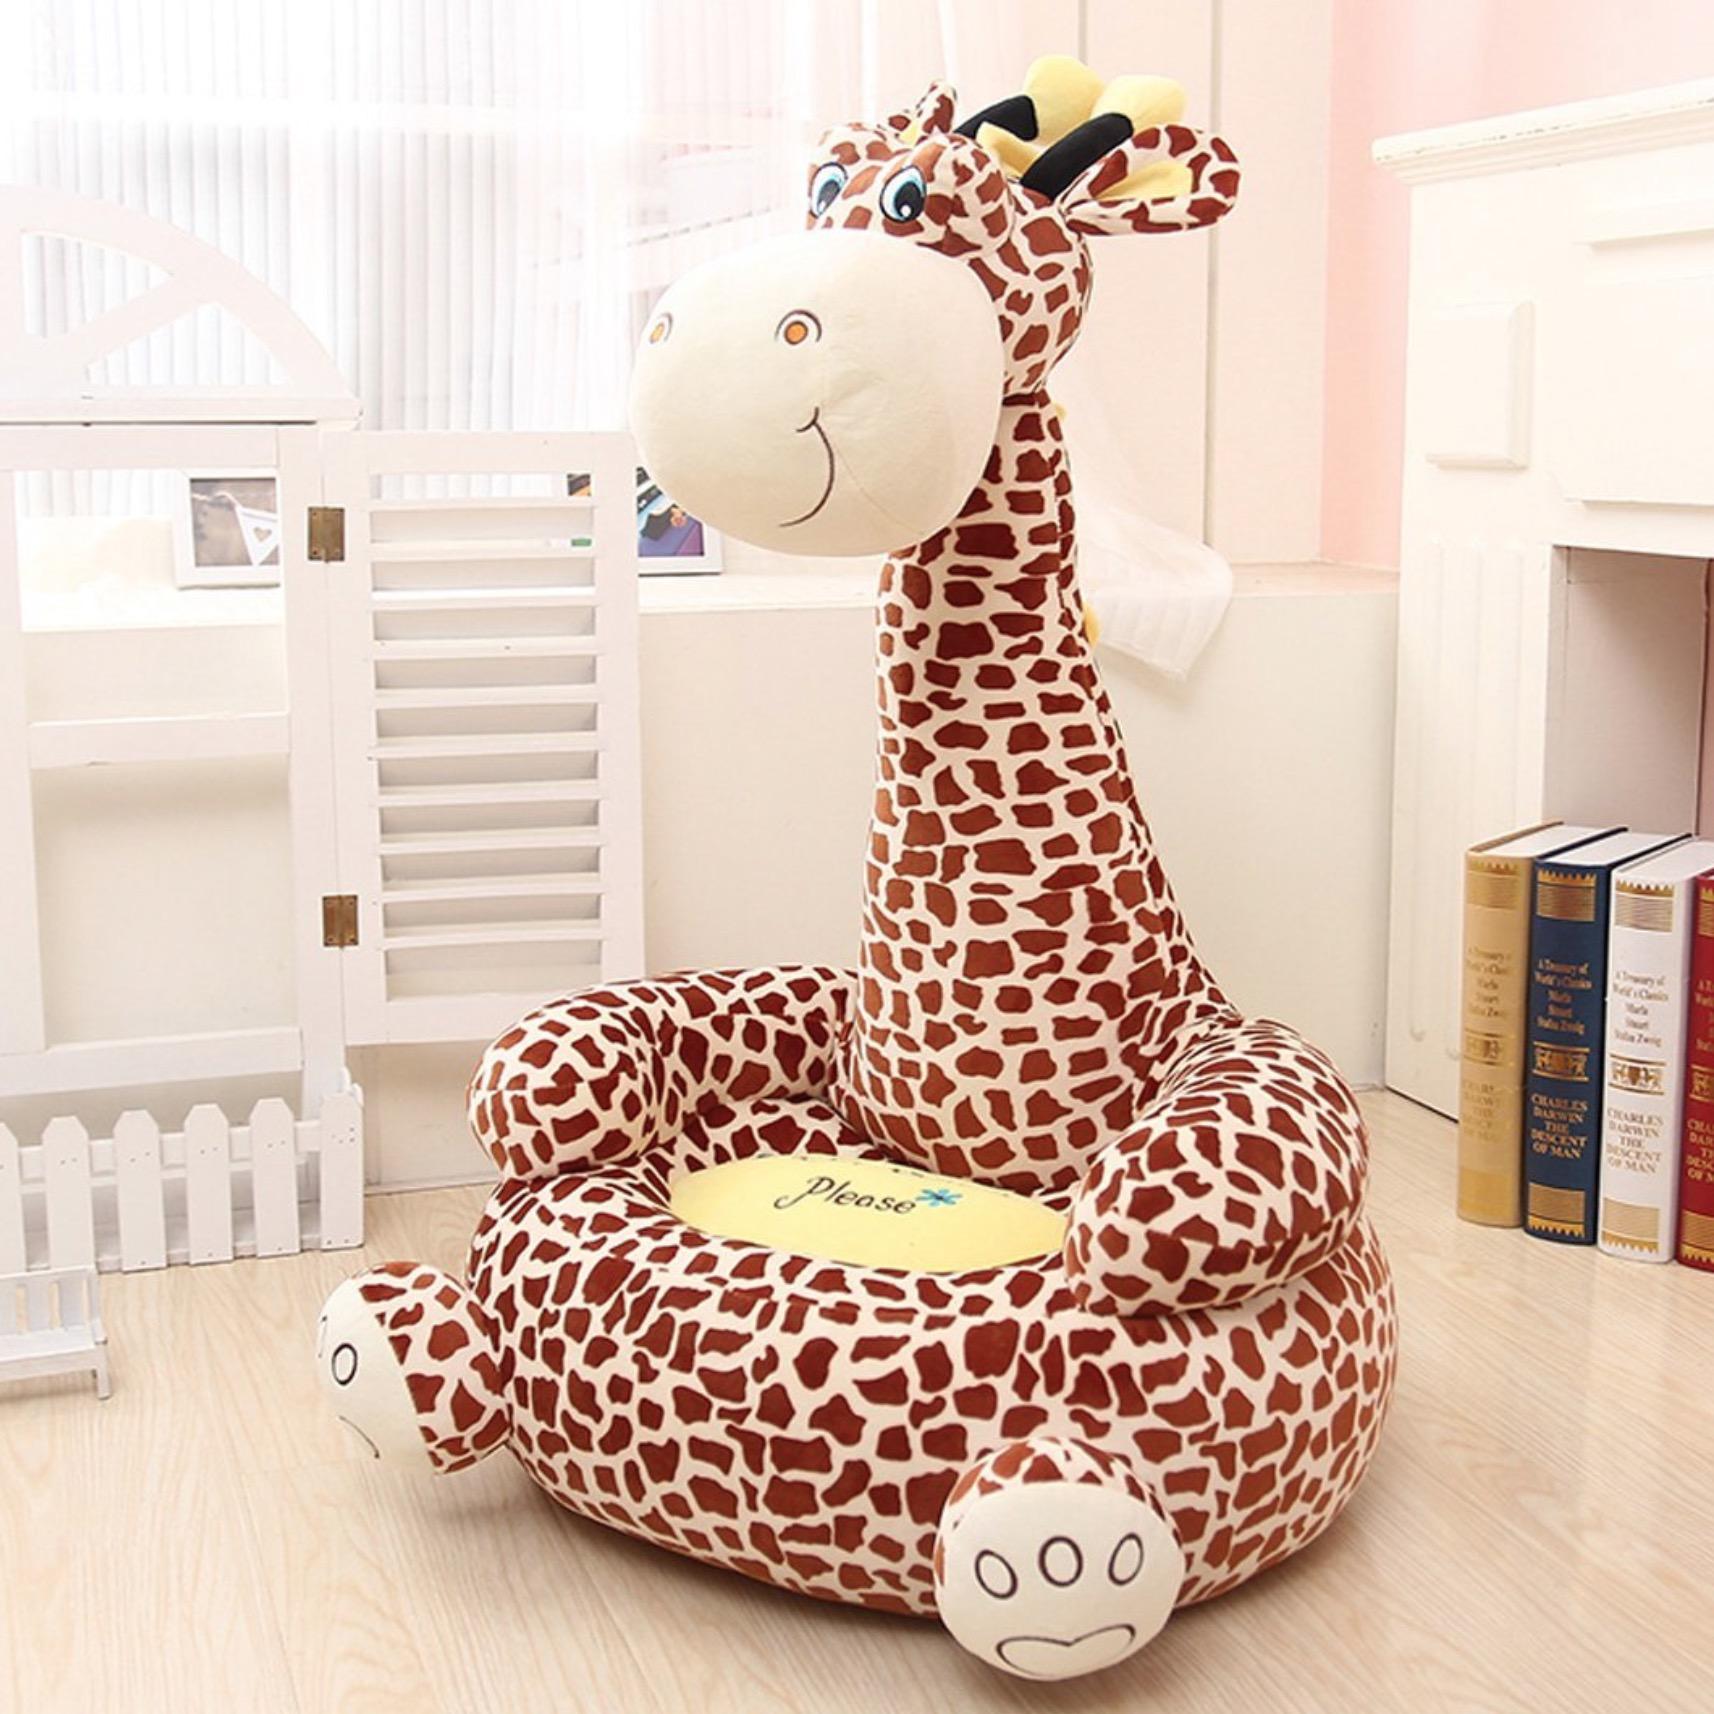 childrens plush chairs yellow side chair animal bean bag for children giraffe monkey